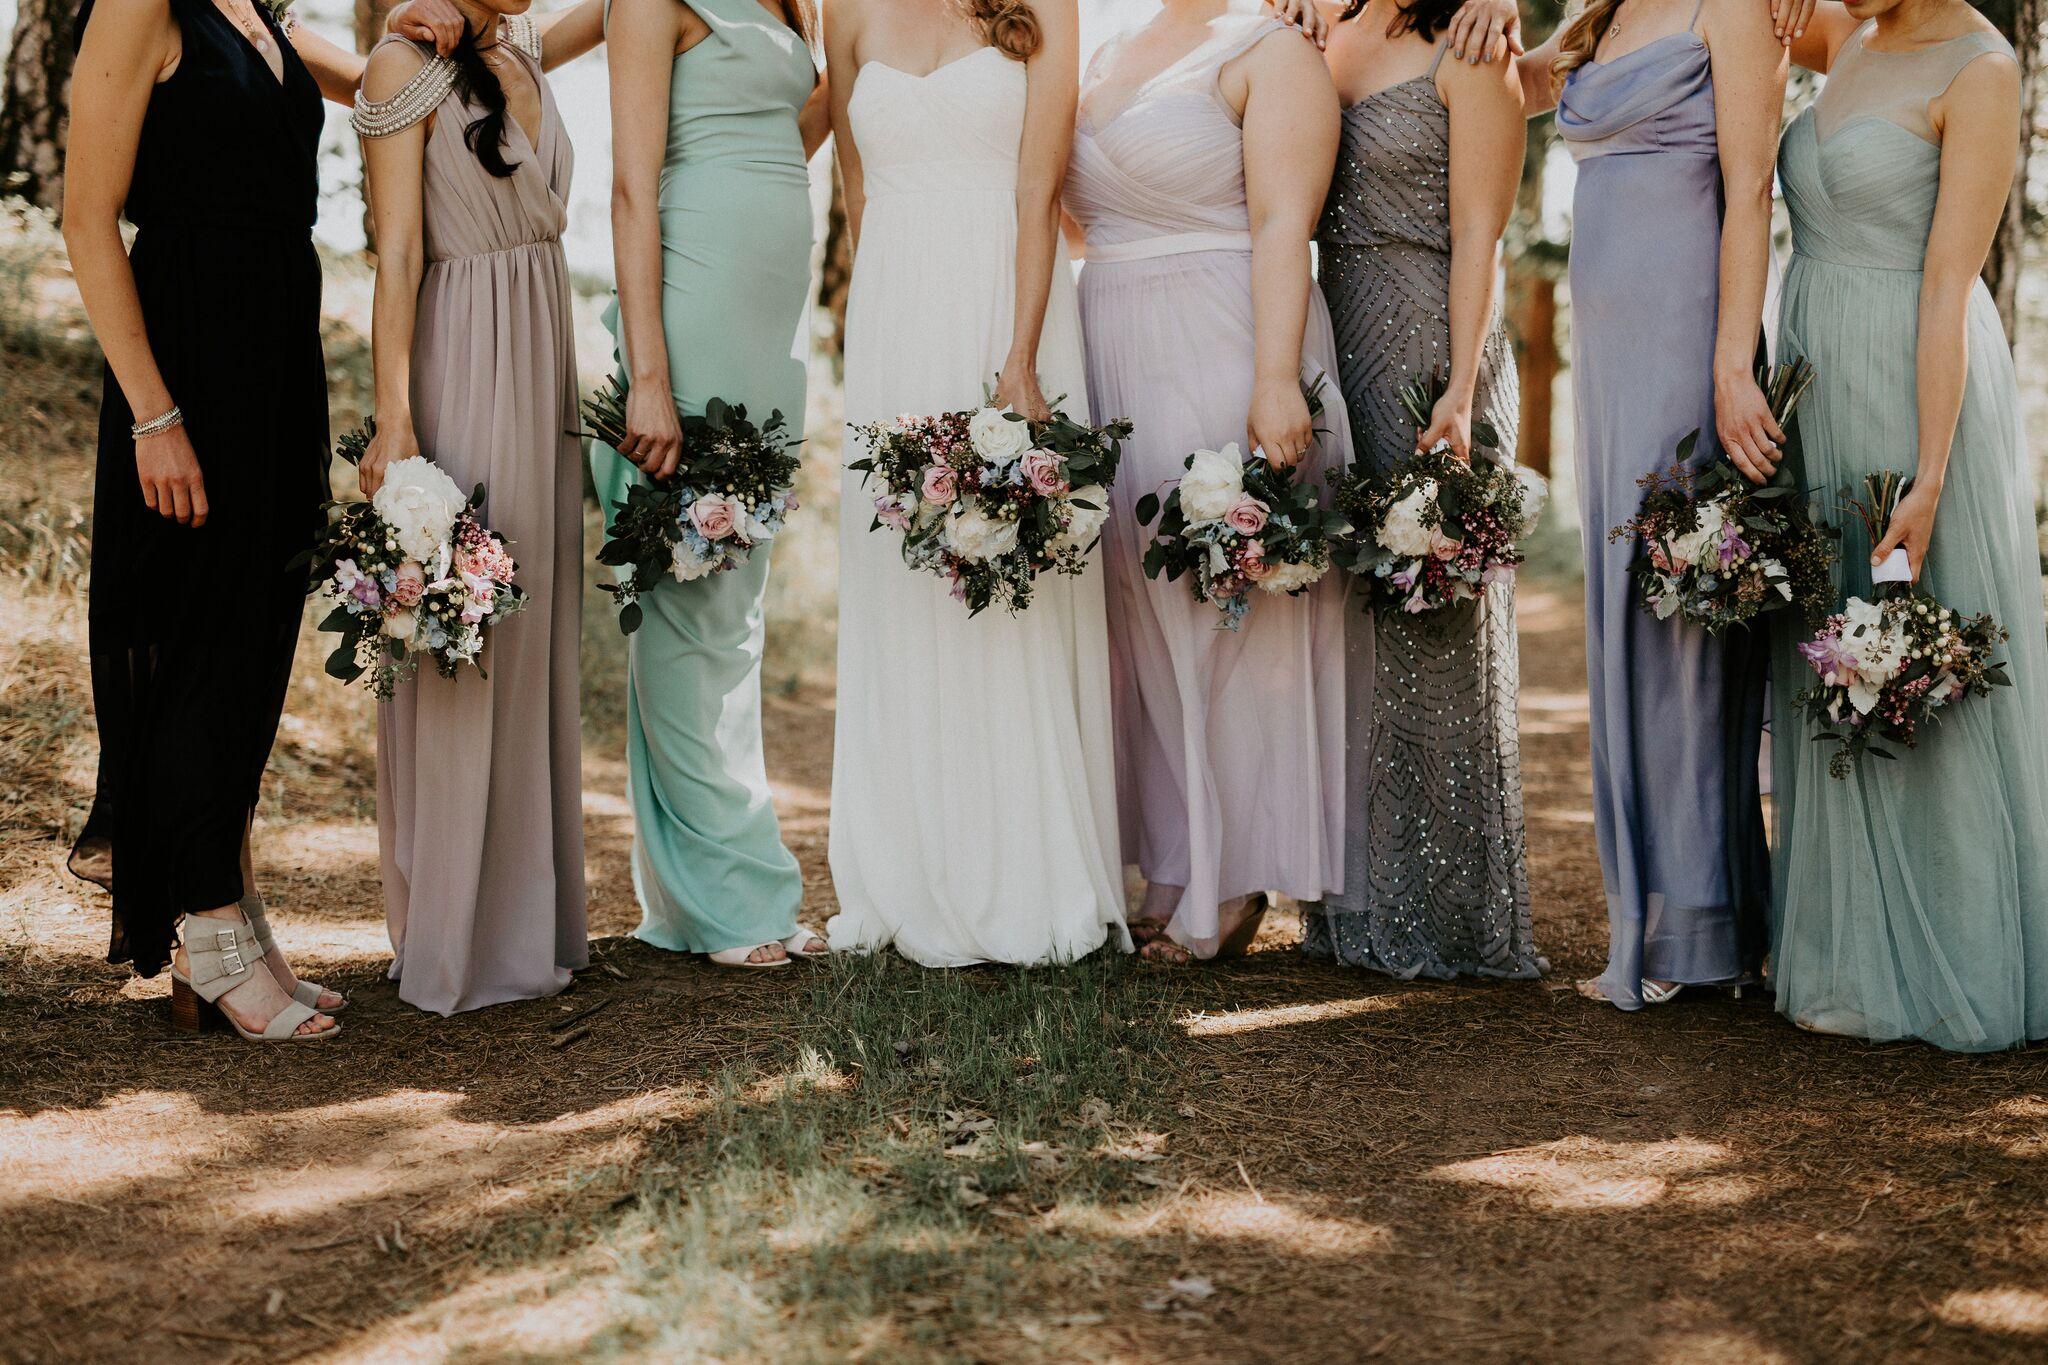 107 - Bridesmaids_preview.jpg